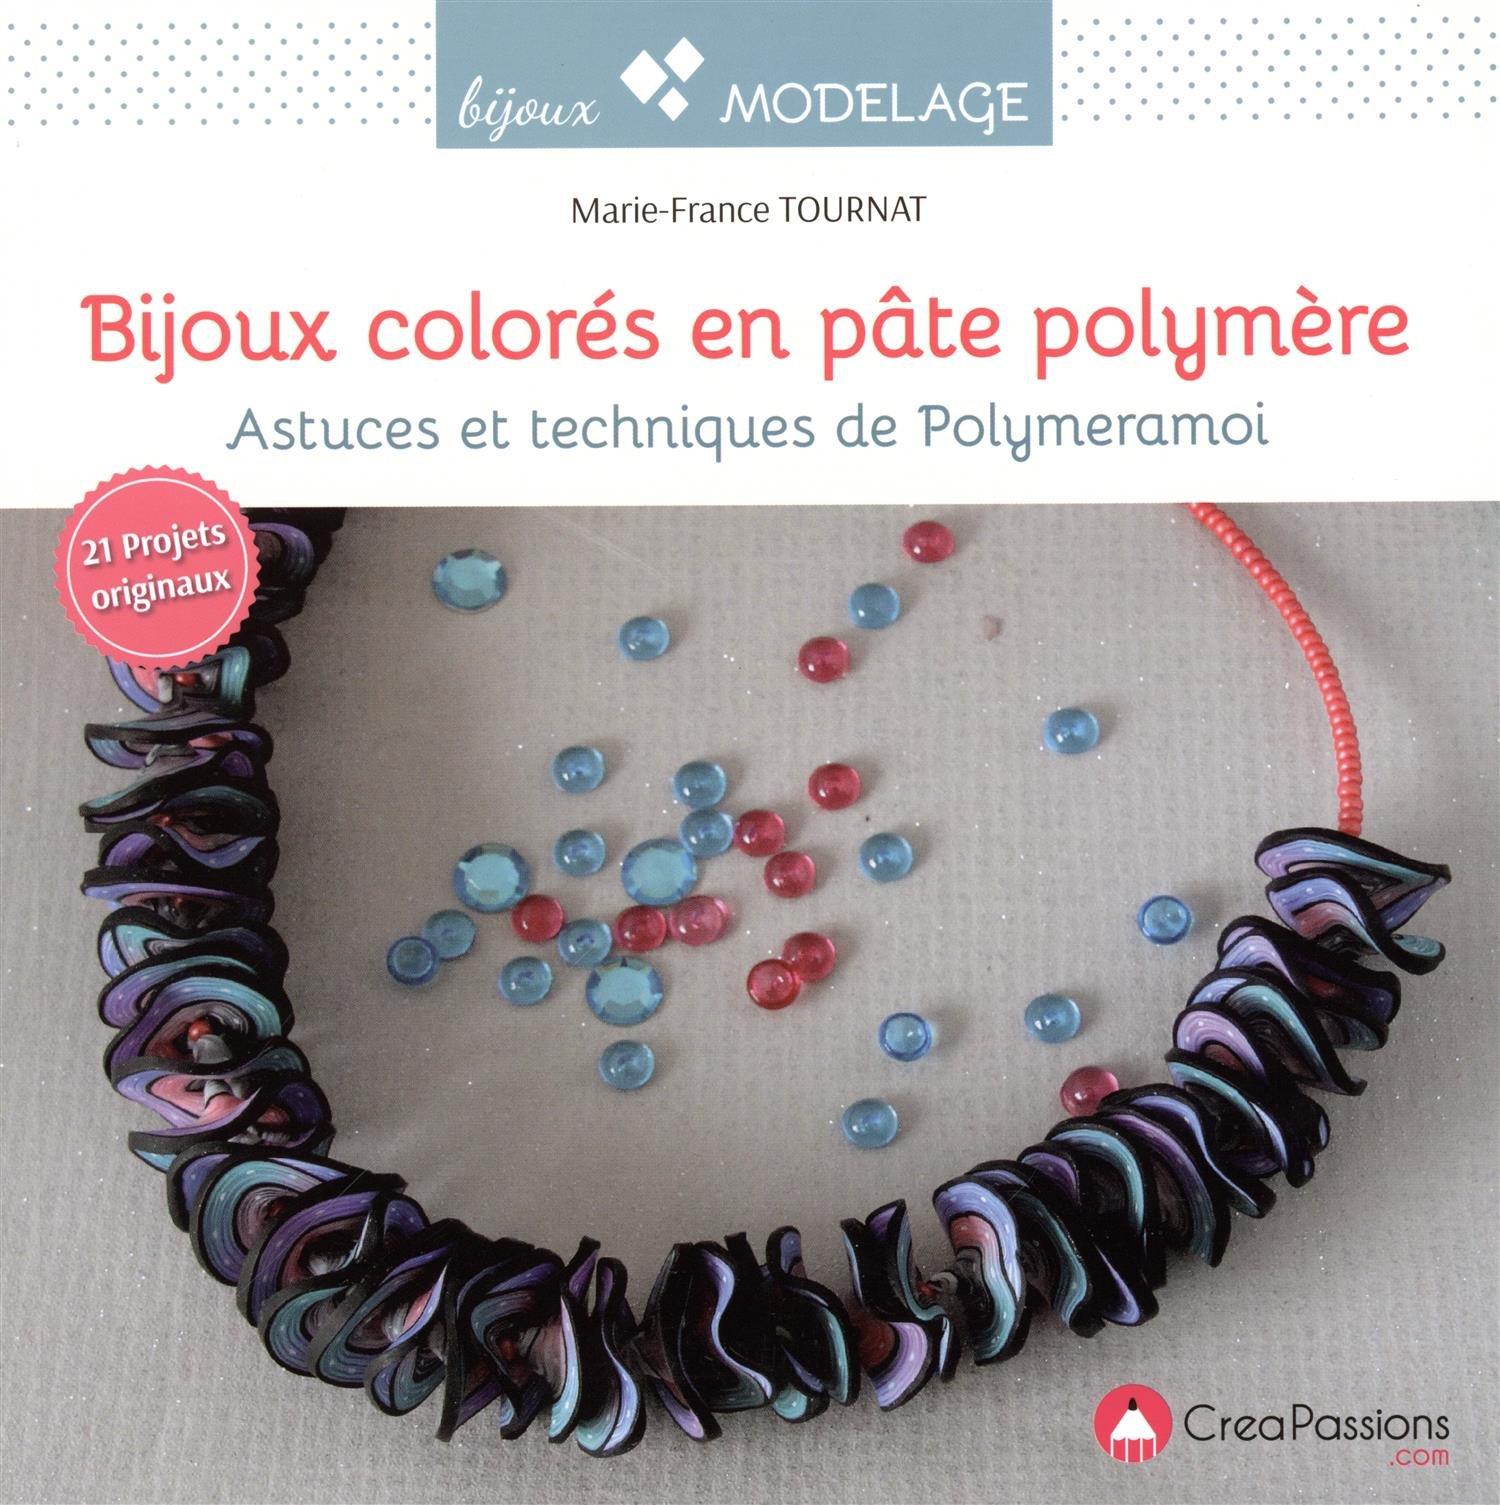 6cae4eba93a Bijoux colores en pate polymere  Amazon.ca  Marie-France Tournat  Books